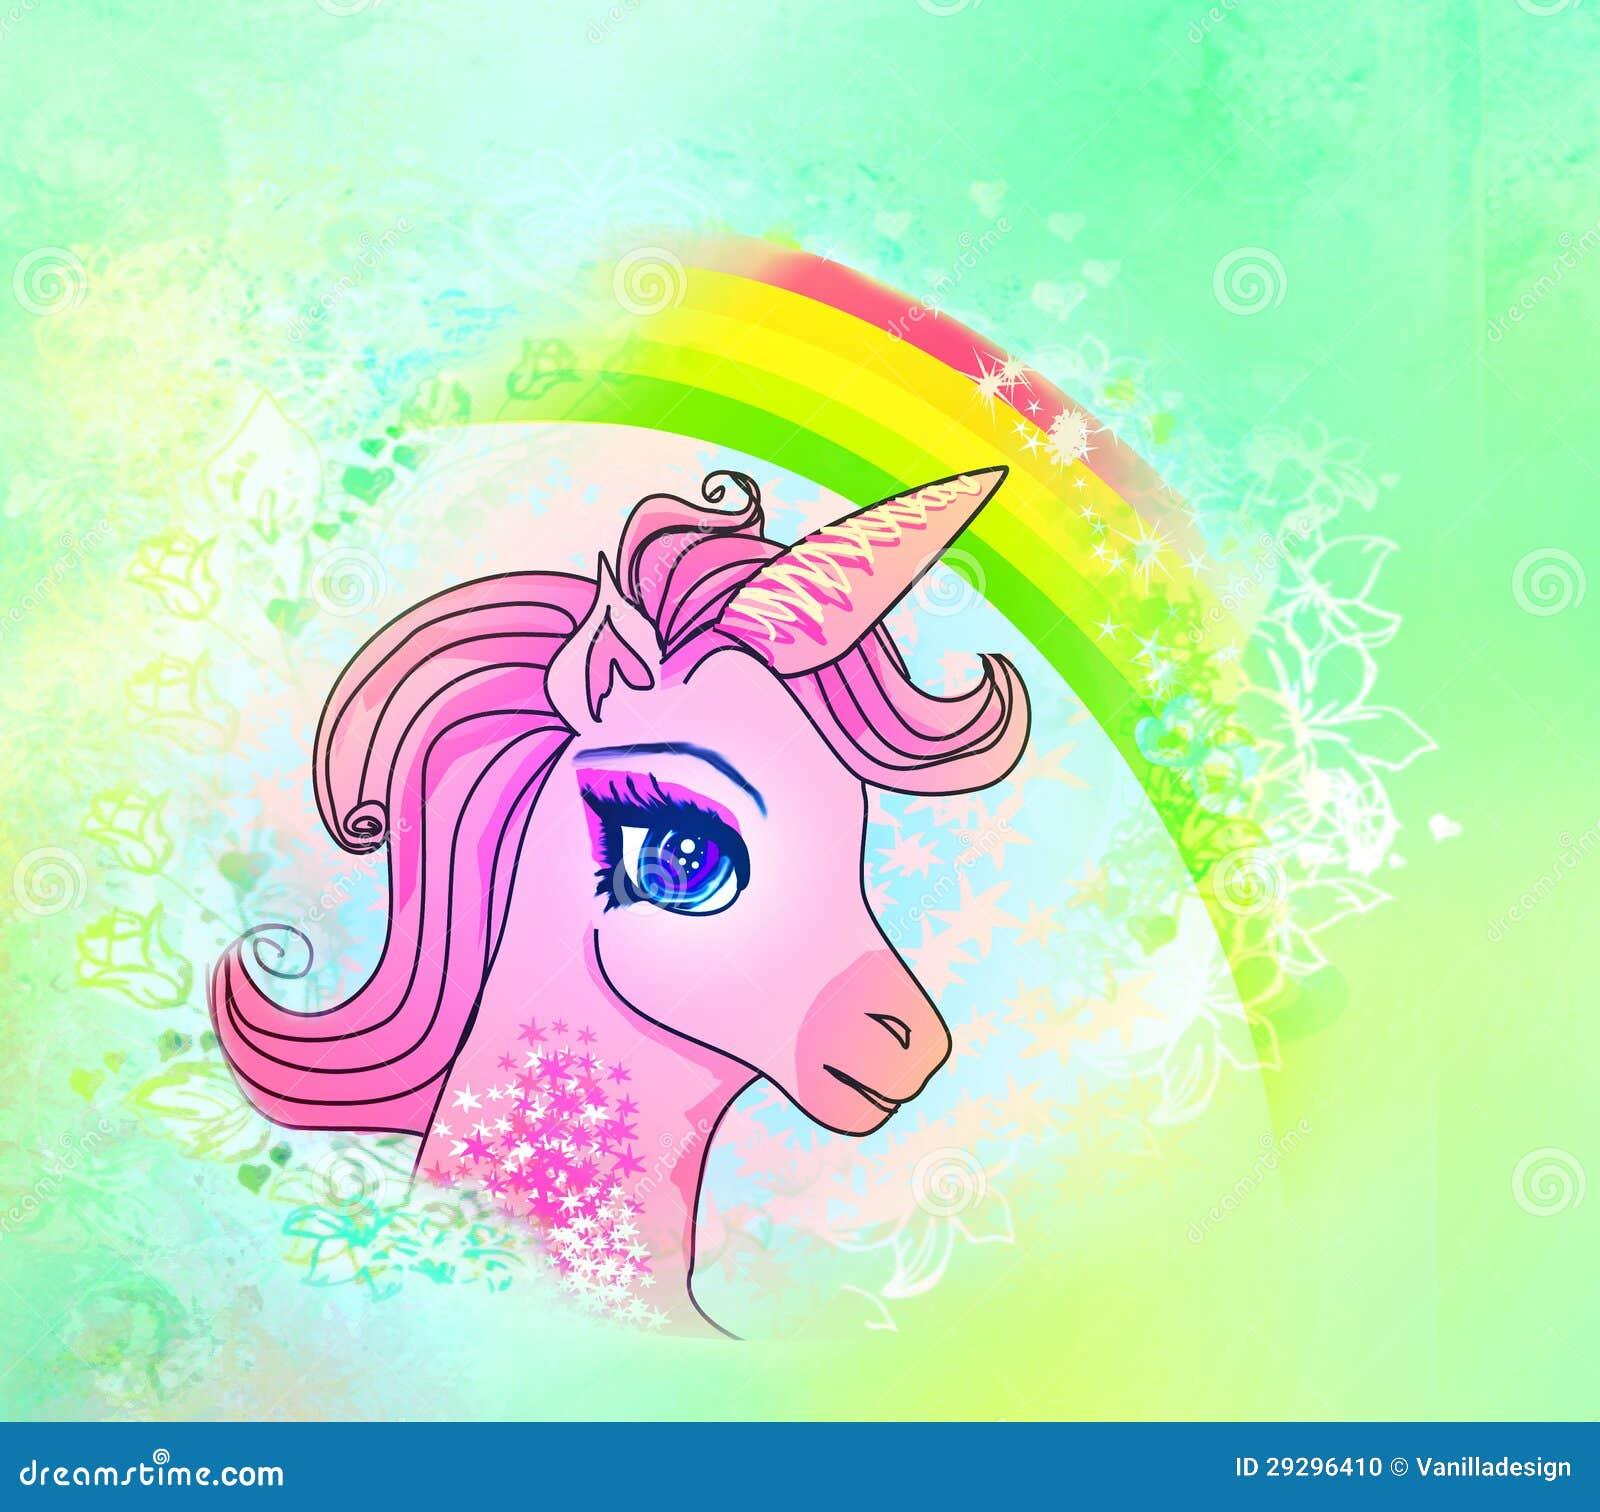 311522499204184332 in addition Unicorns Kitchen Great Unicorn Themed Recipes likewise 565177 further How To Draw Vanellope Dragon Art likewise Healthy Starbucks Unicorn Frappuccino Paleo Vegan Gluten Free. on naughty unicorn